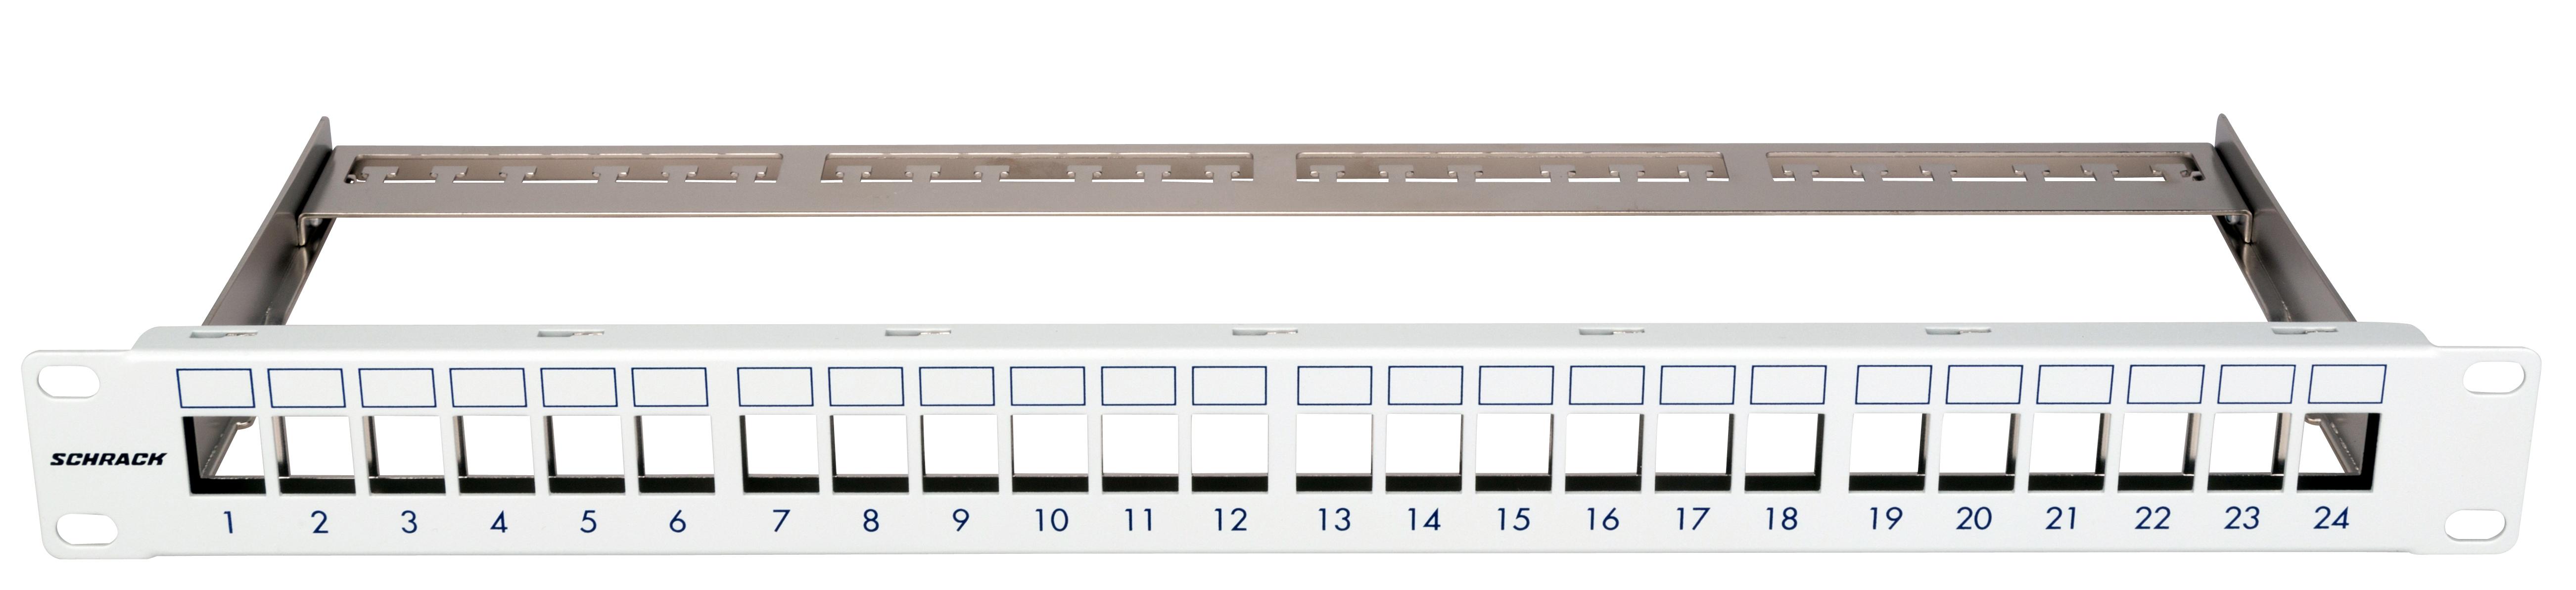 1 Stk Patchpanel 19 leer für 24 Module (SFA)(SFB), 1HE, RAL7035 HSER0240GS